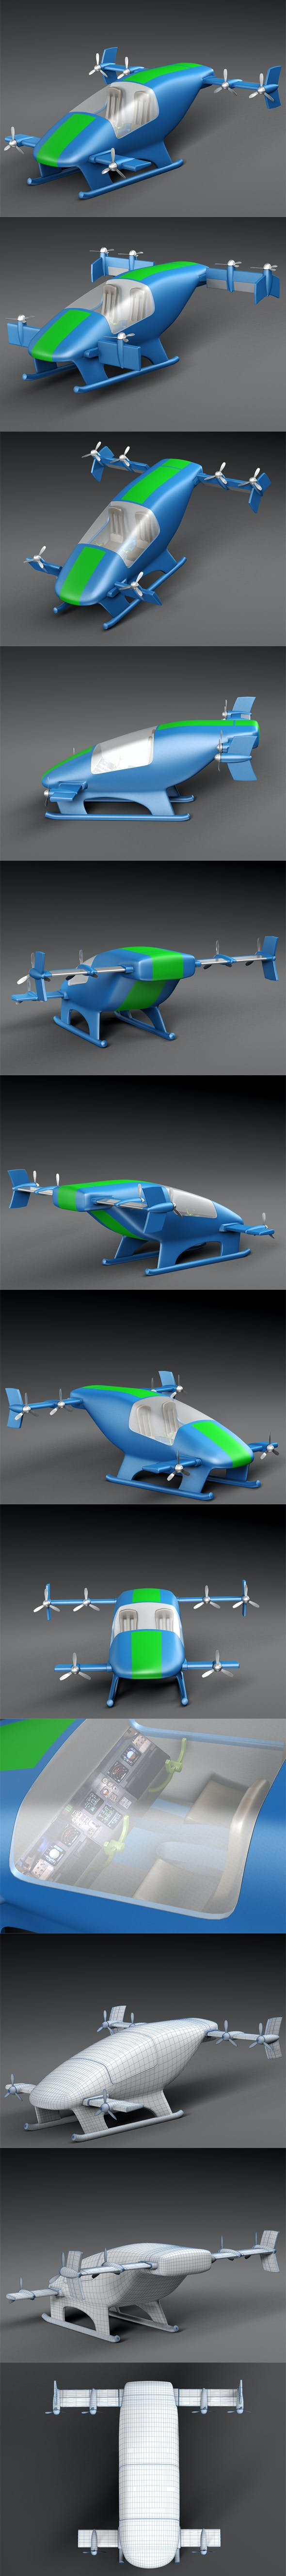 Flying Car Prototype - 3DOcean Item for Sale